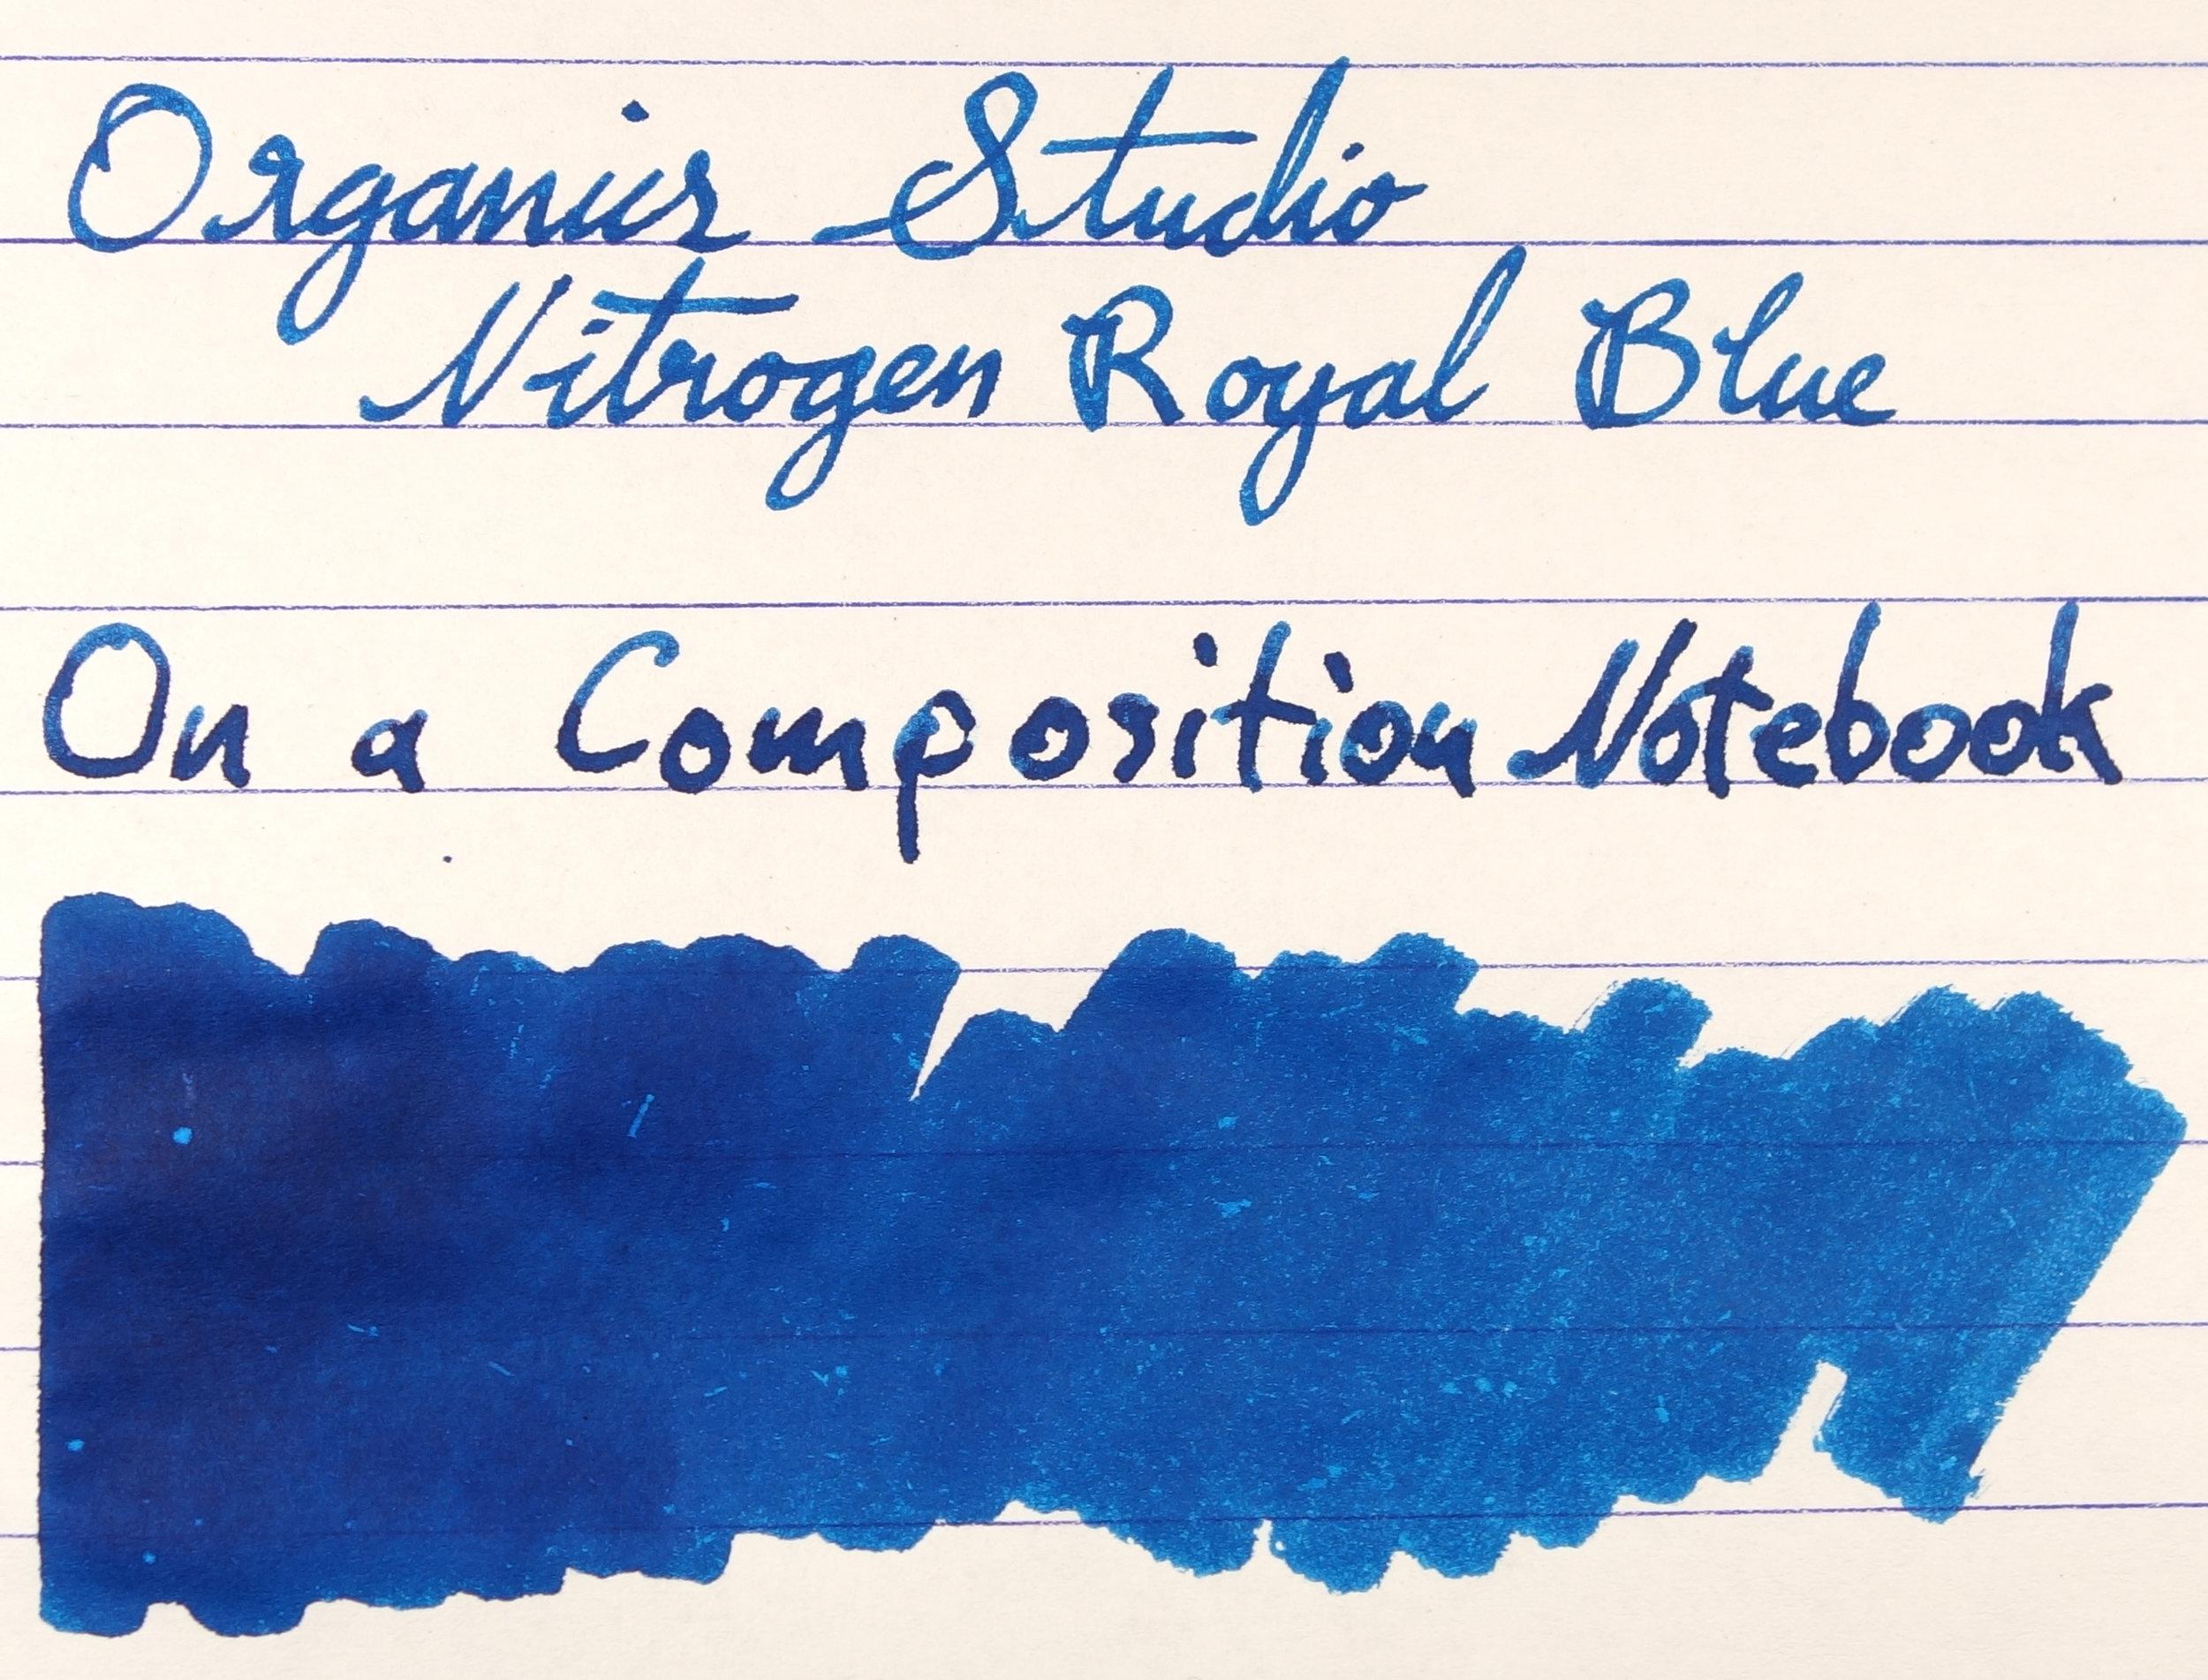 Composition Notebook.jpg